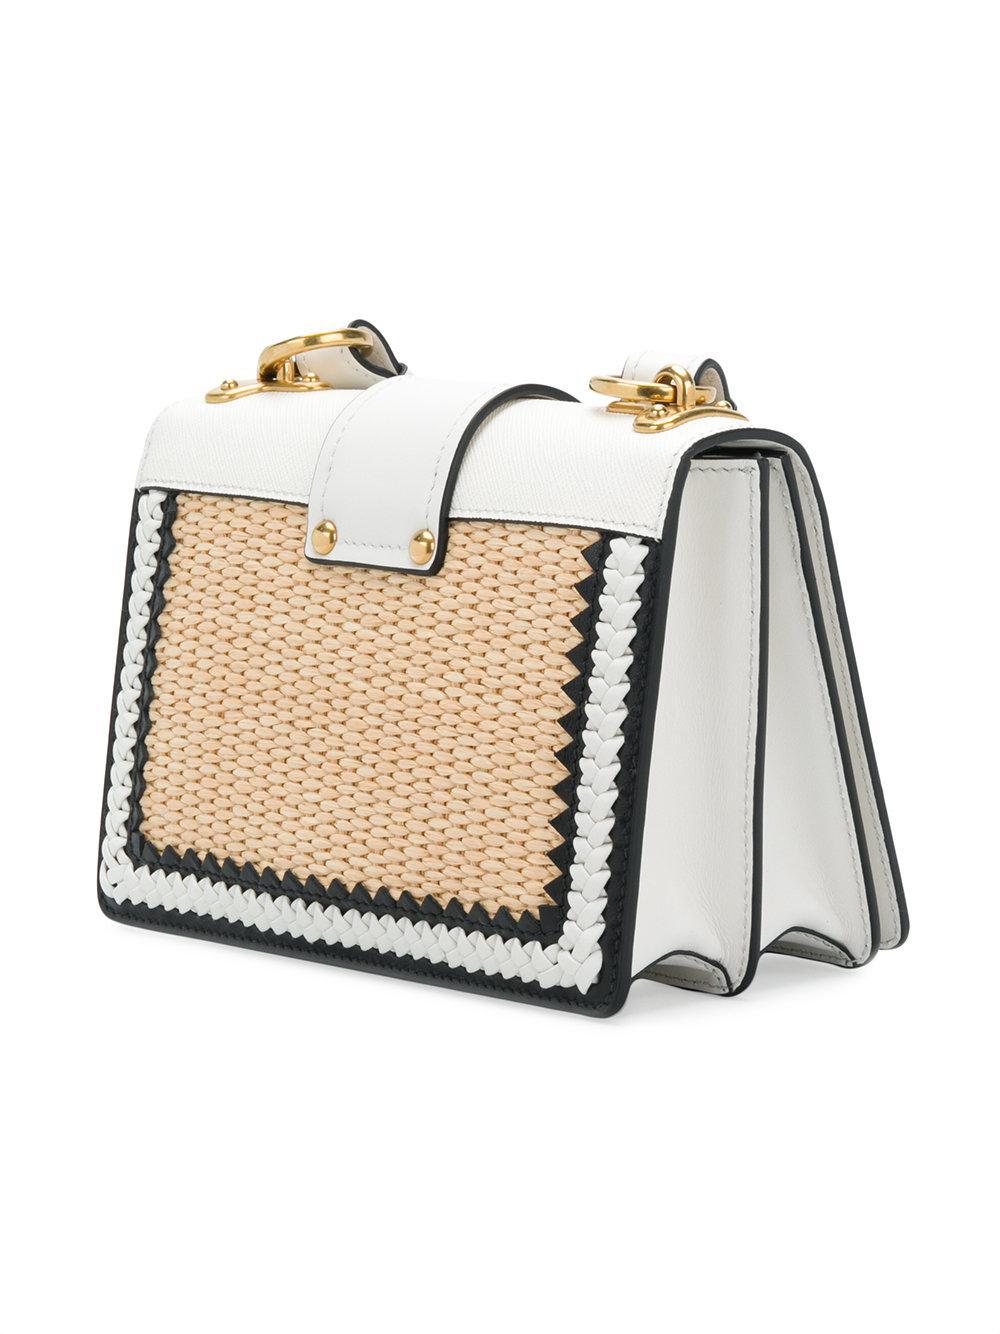 Prada Cahier Straw Shoulder Bag in White - Lyst 97cc8beae9a41